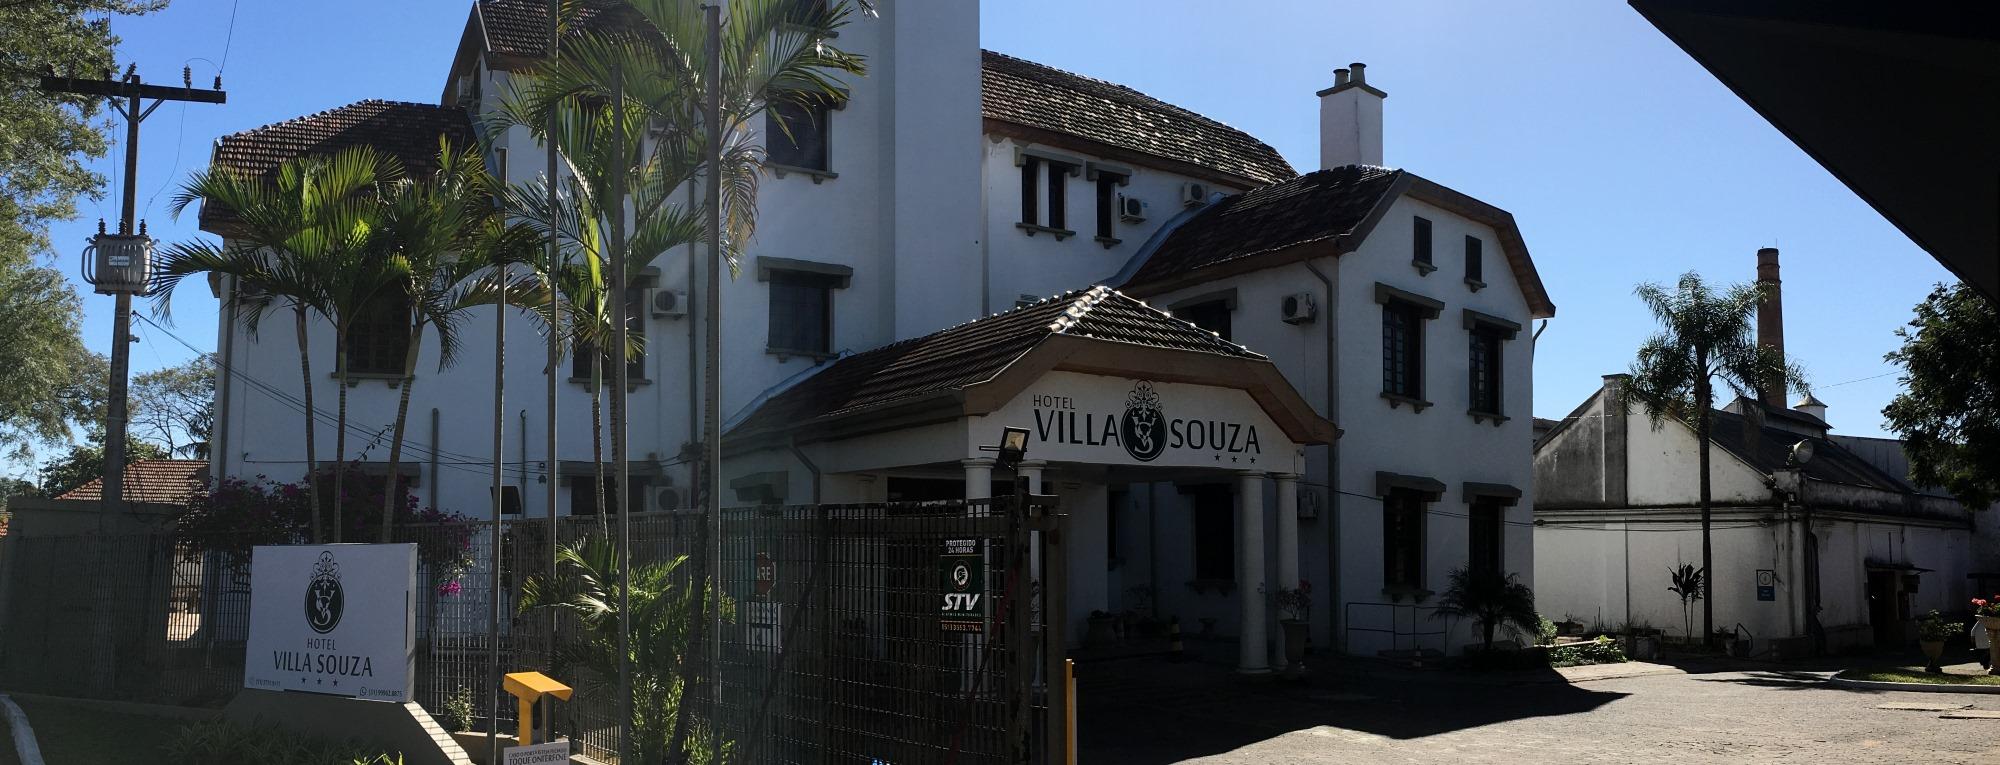 fachada_hotel